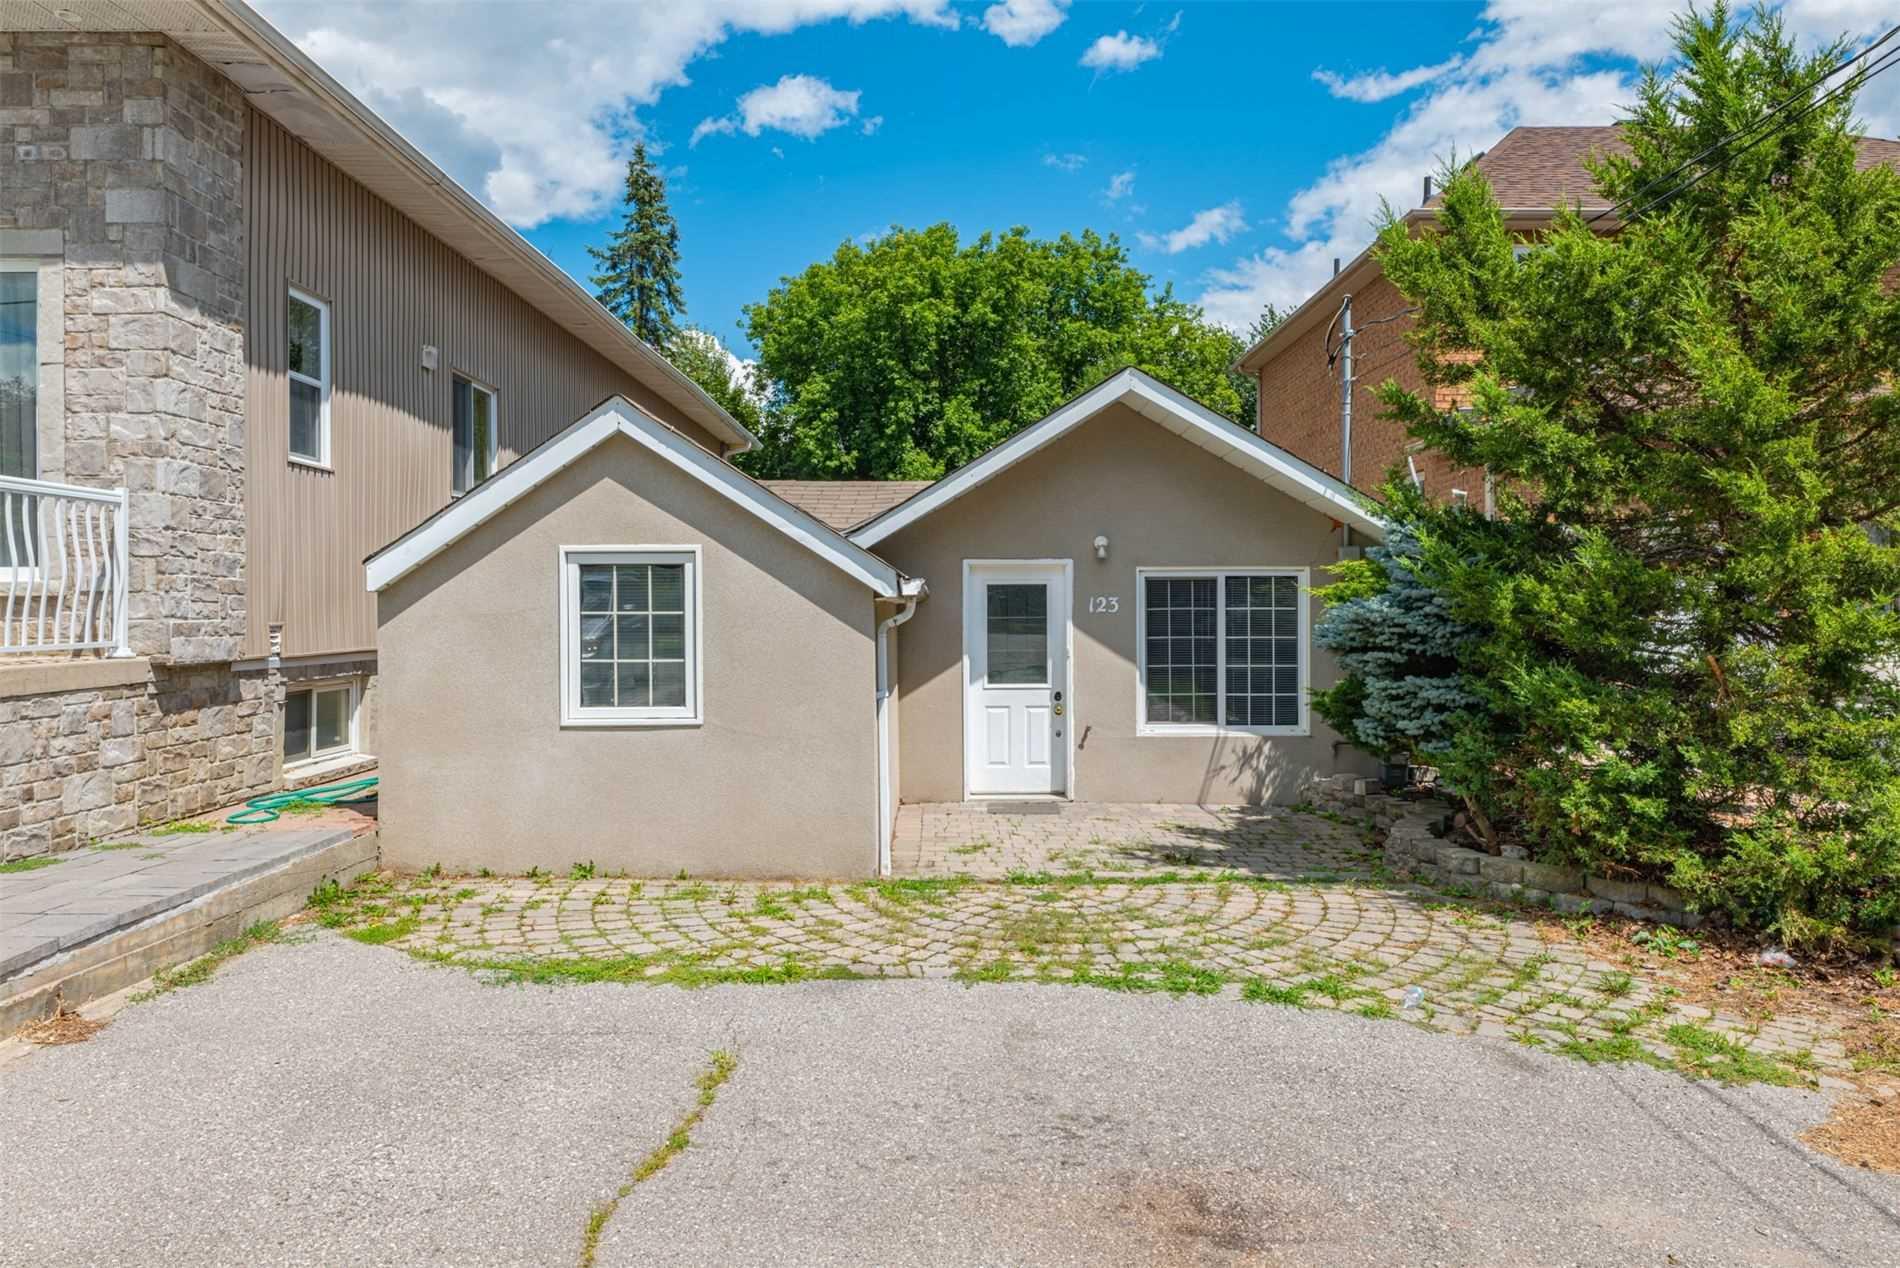 123 Wildwood Ave, Richmond Hill, Ontario L4E3B6, 2 Bedrooms Bedrooms, 5 Rooms Rooms,1 BathroomBathrooms,Detached,For Sale,Wildwood,N4849718